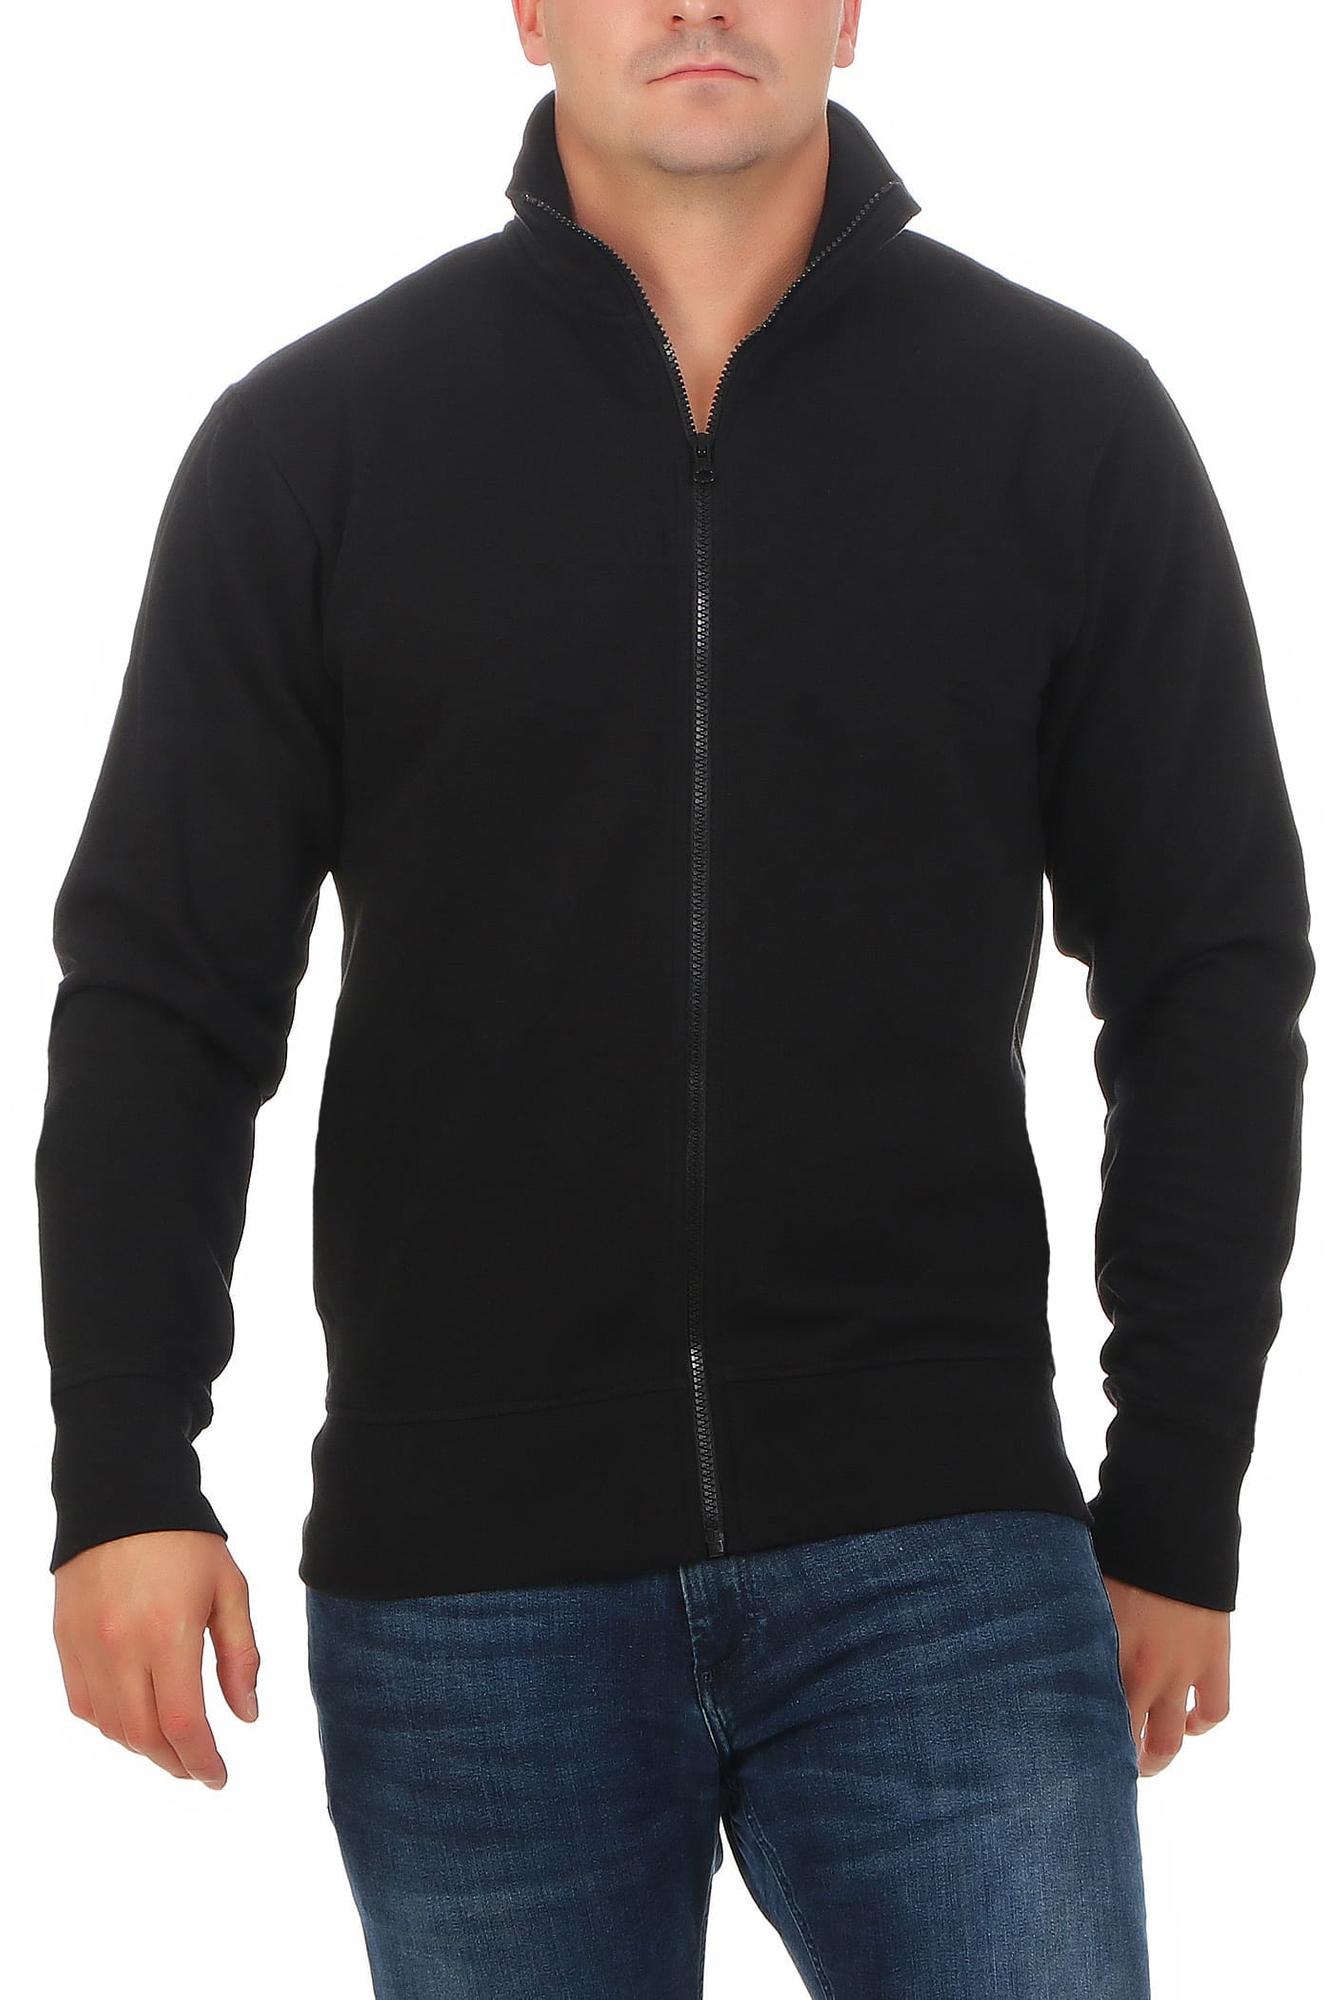 b310f9e2e731ca Herren Sweatshirt Jacke ohne Kapuze Houston